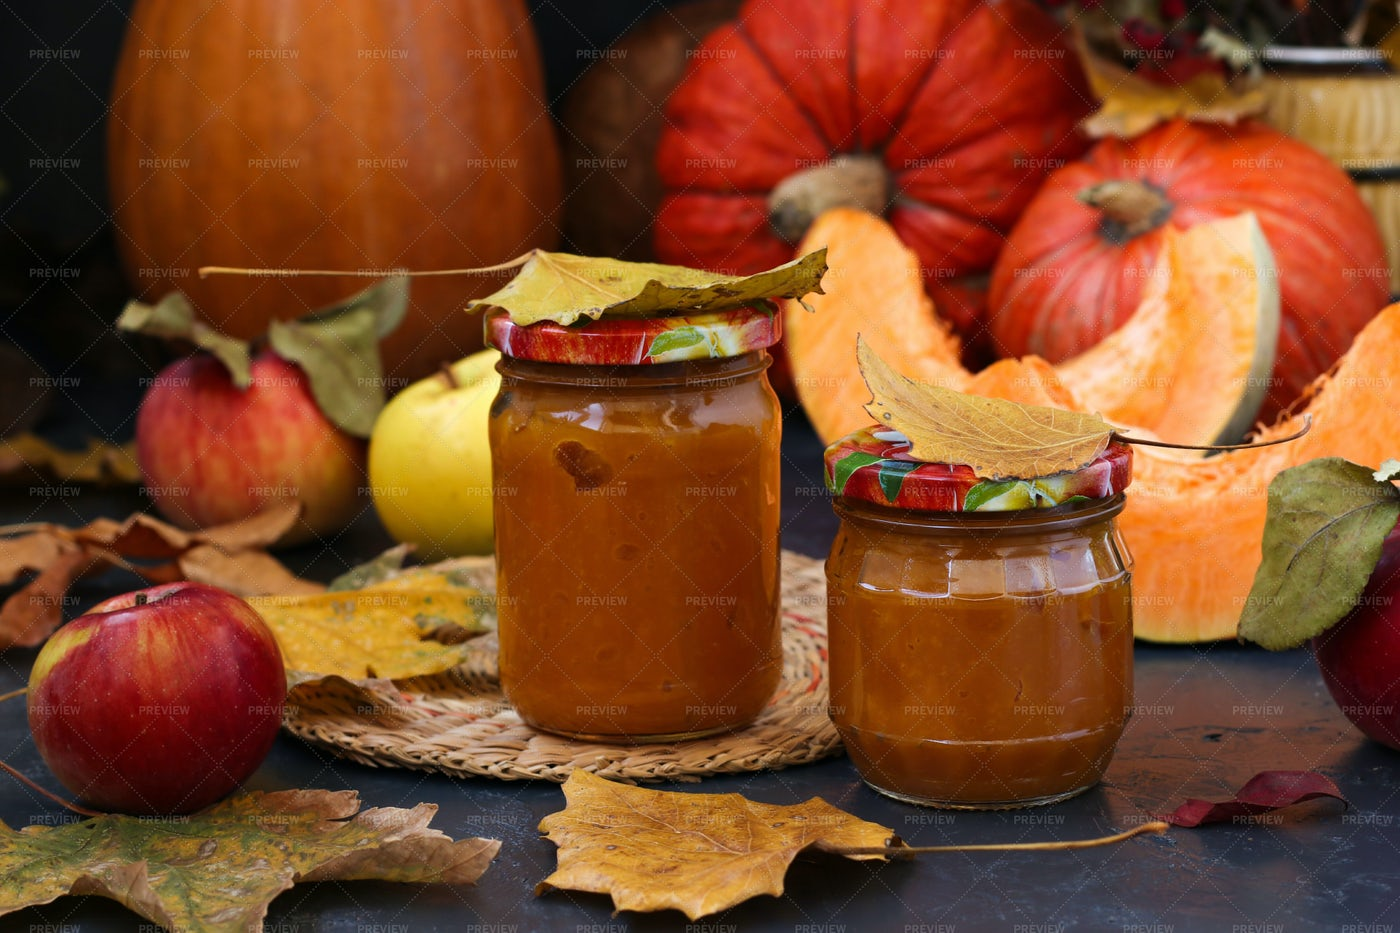 Homemade Puree Pumpkin And Apples: Stock Photos